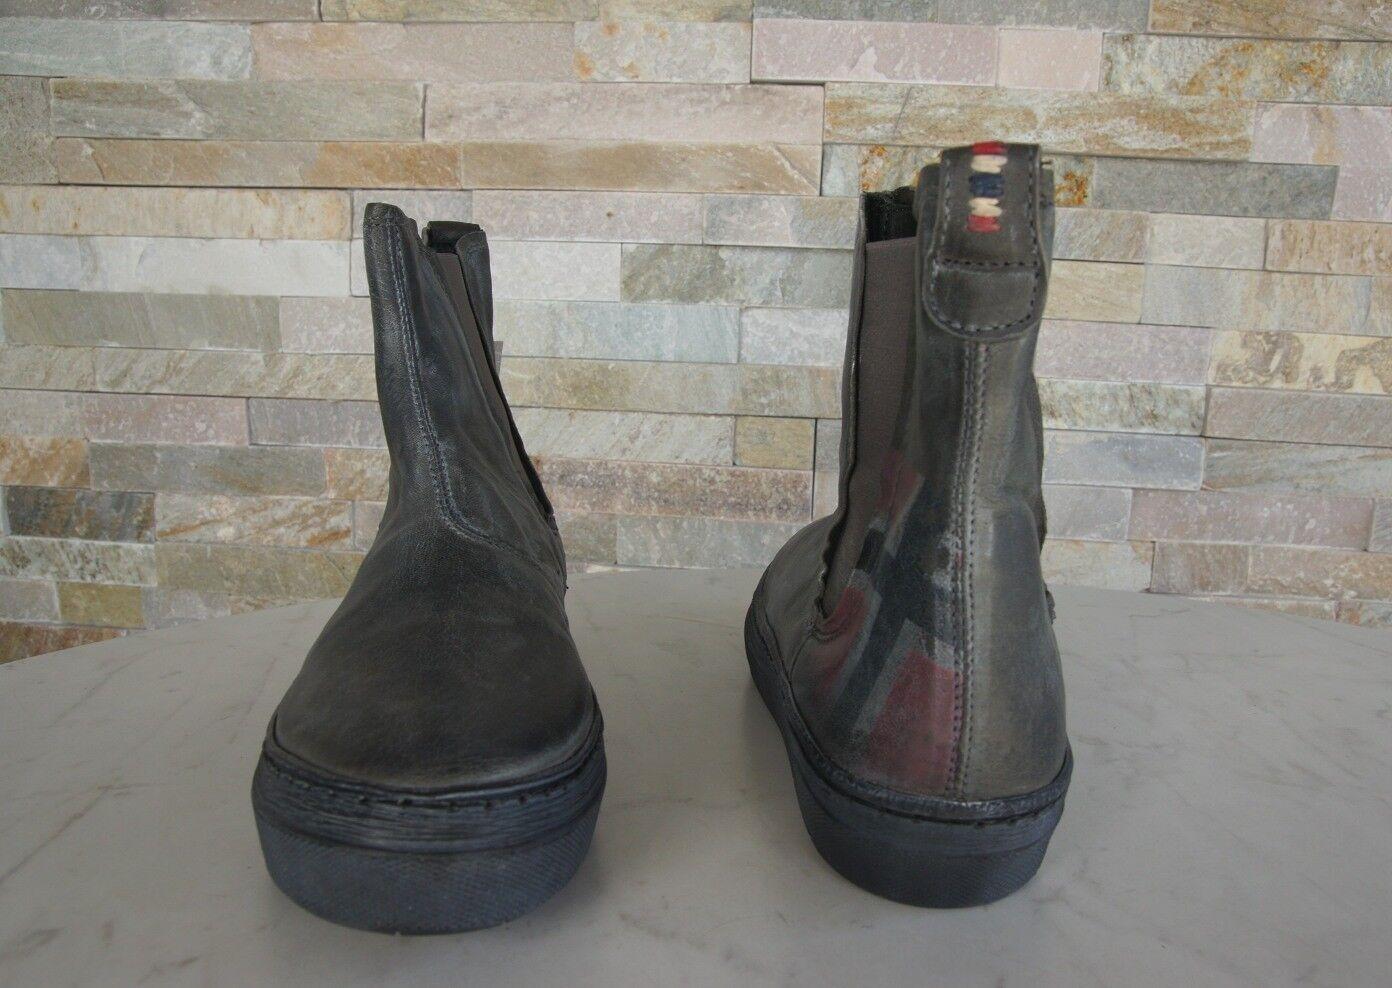 NAPAPIJRI Gr 37 Stiefeletten Fiona booties Fiona Stiefeletten Schuhe schwarz grau NEU ehem 16402c